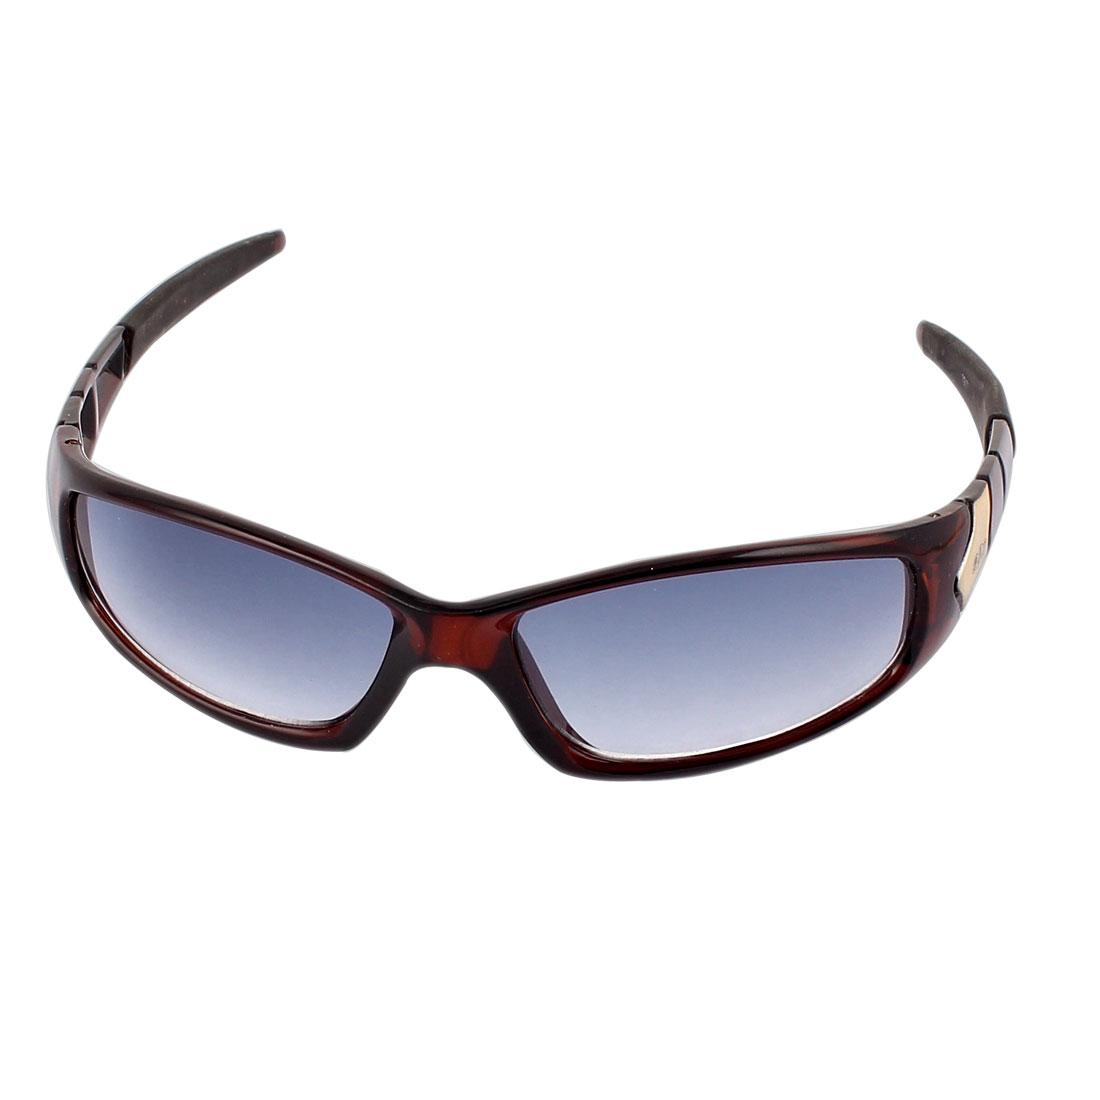 Plastic Full Frame Outdoor Driving Sunglasses Eyewear Eyeglasses Brown